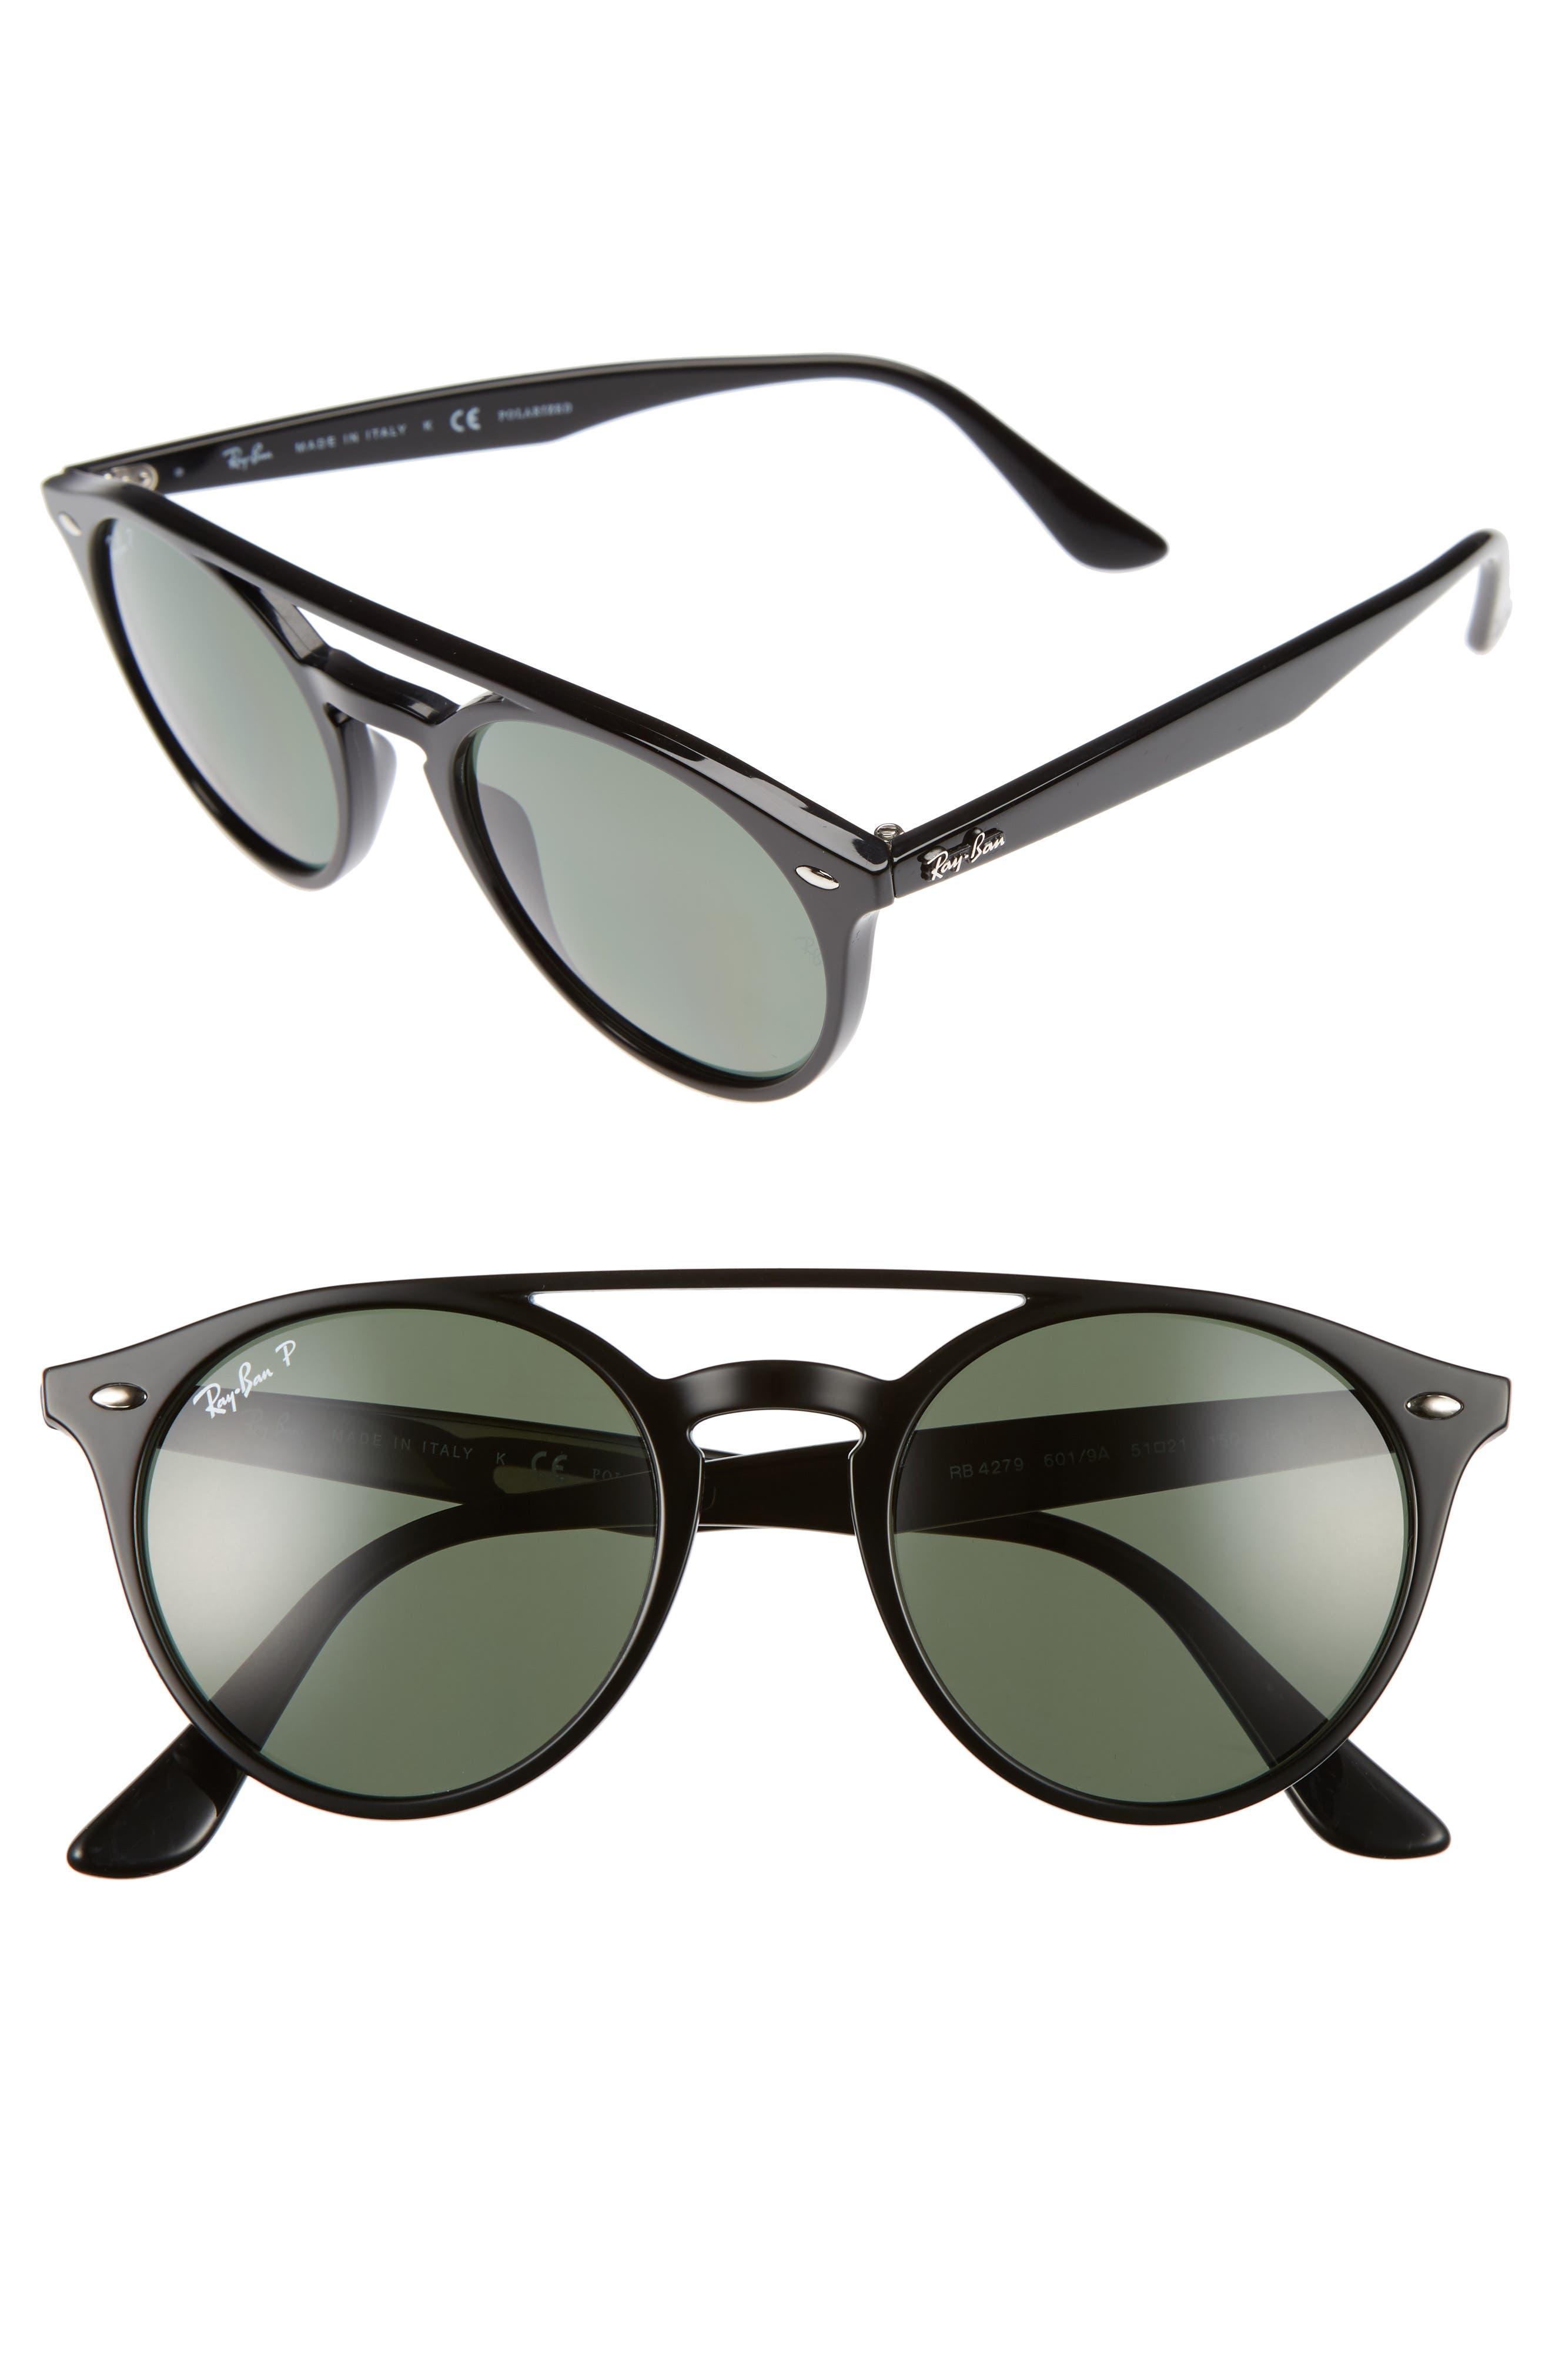 51mm Polarized Round Sunglasses,                         Main,                         color, Black/ Polar